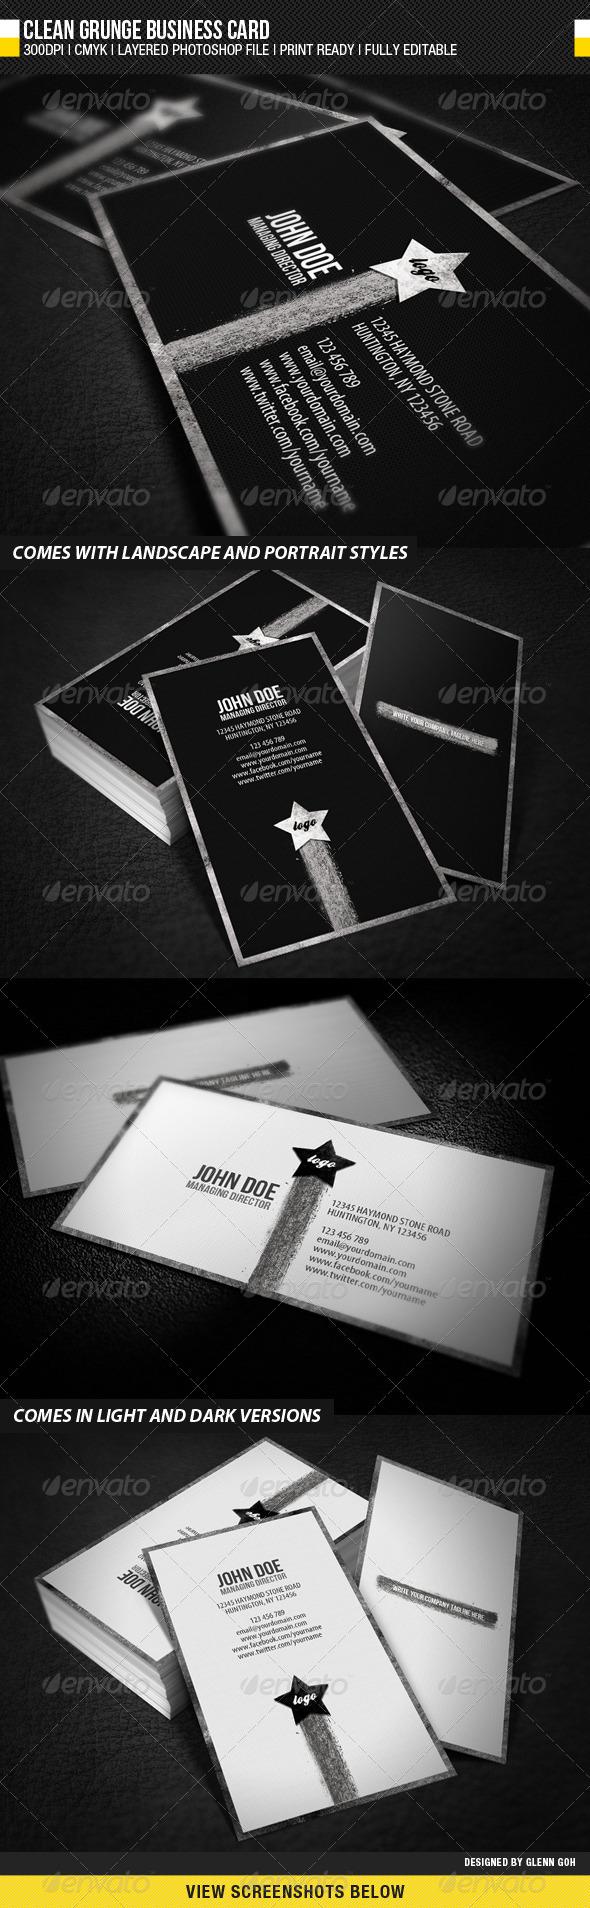 Clean Grunge Business Card - Grunge Business Cards